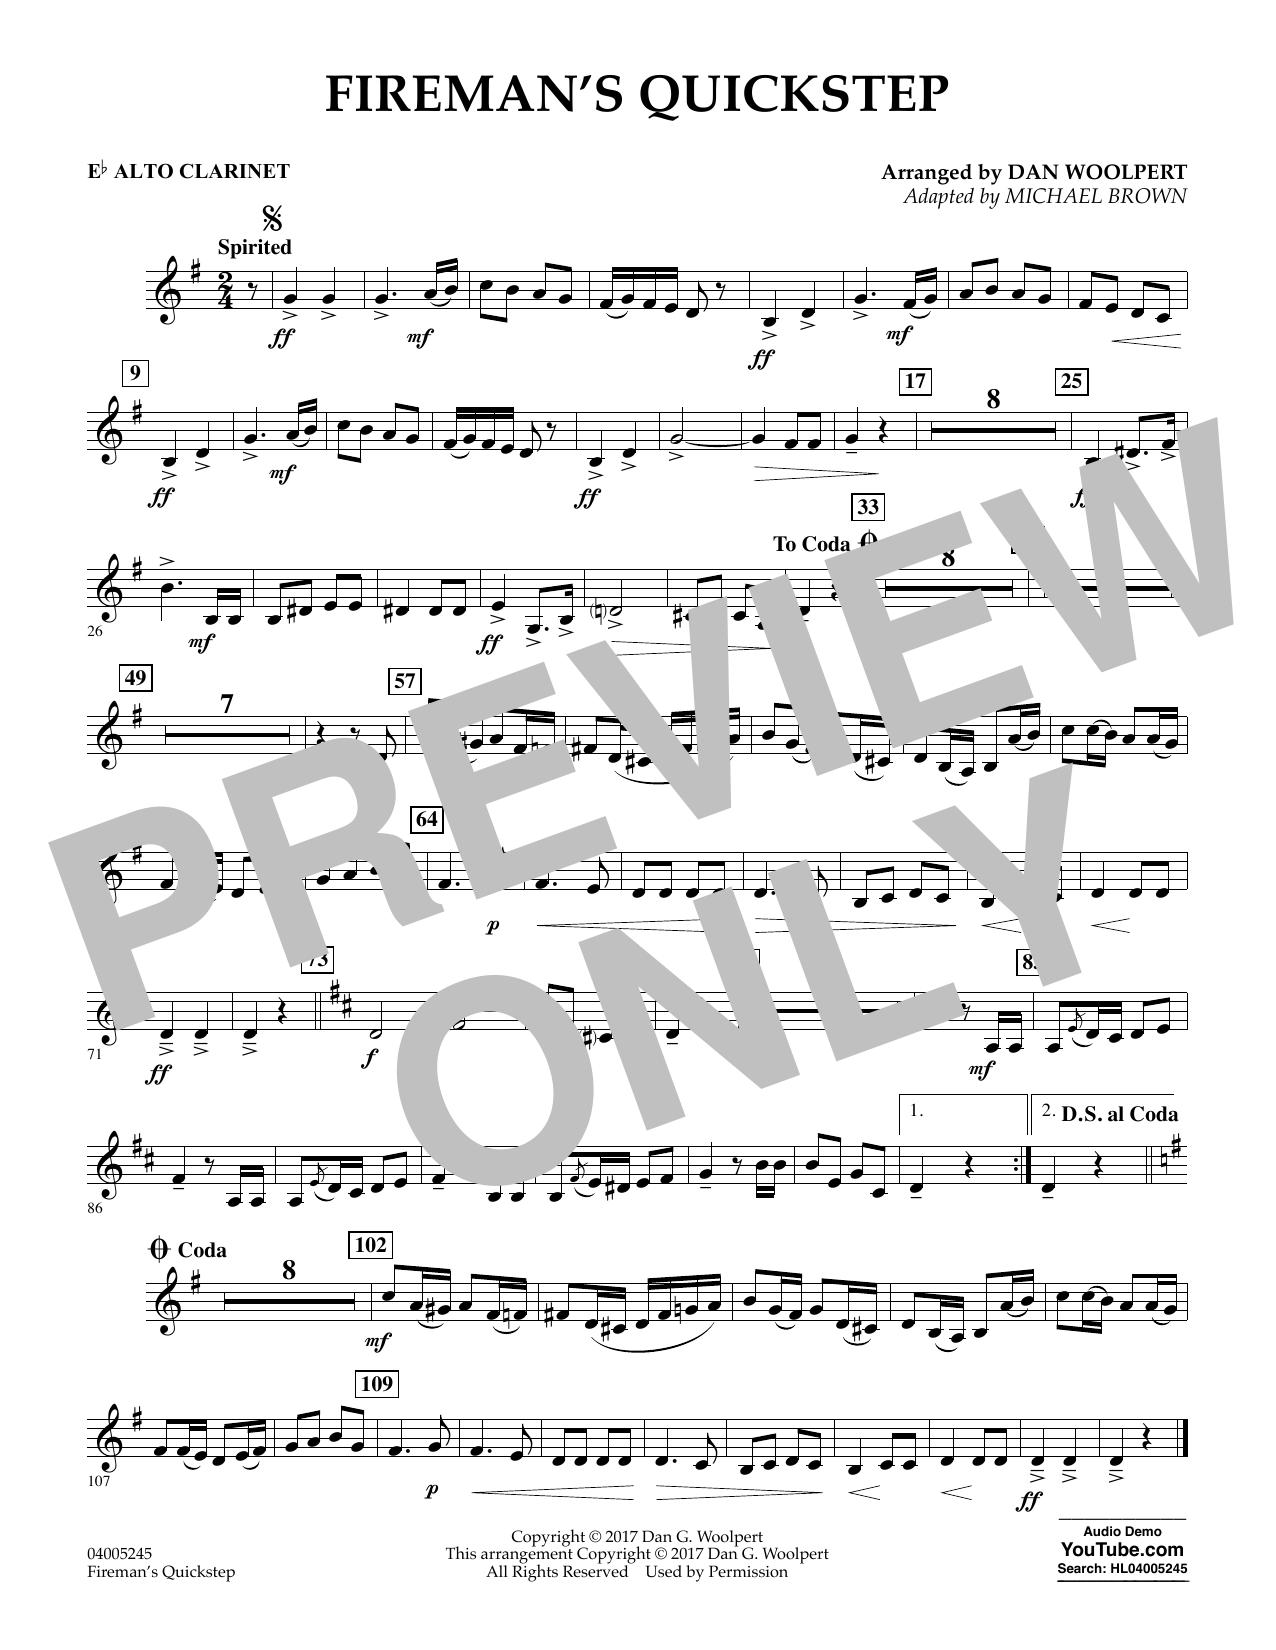 Fireman's Quickstep - Eb Alto Clarinet (Concert Band)